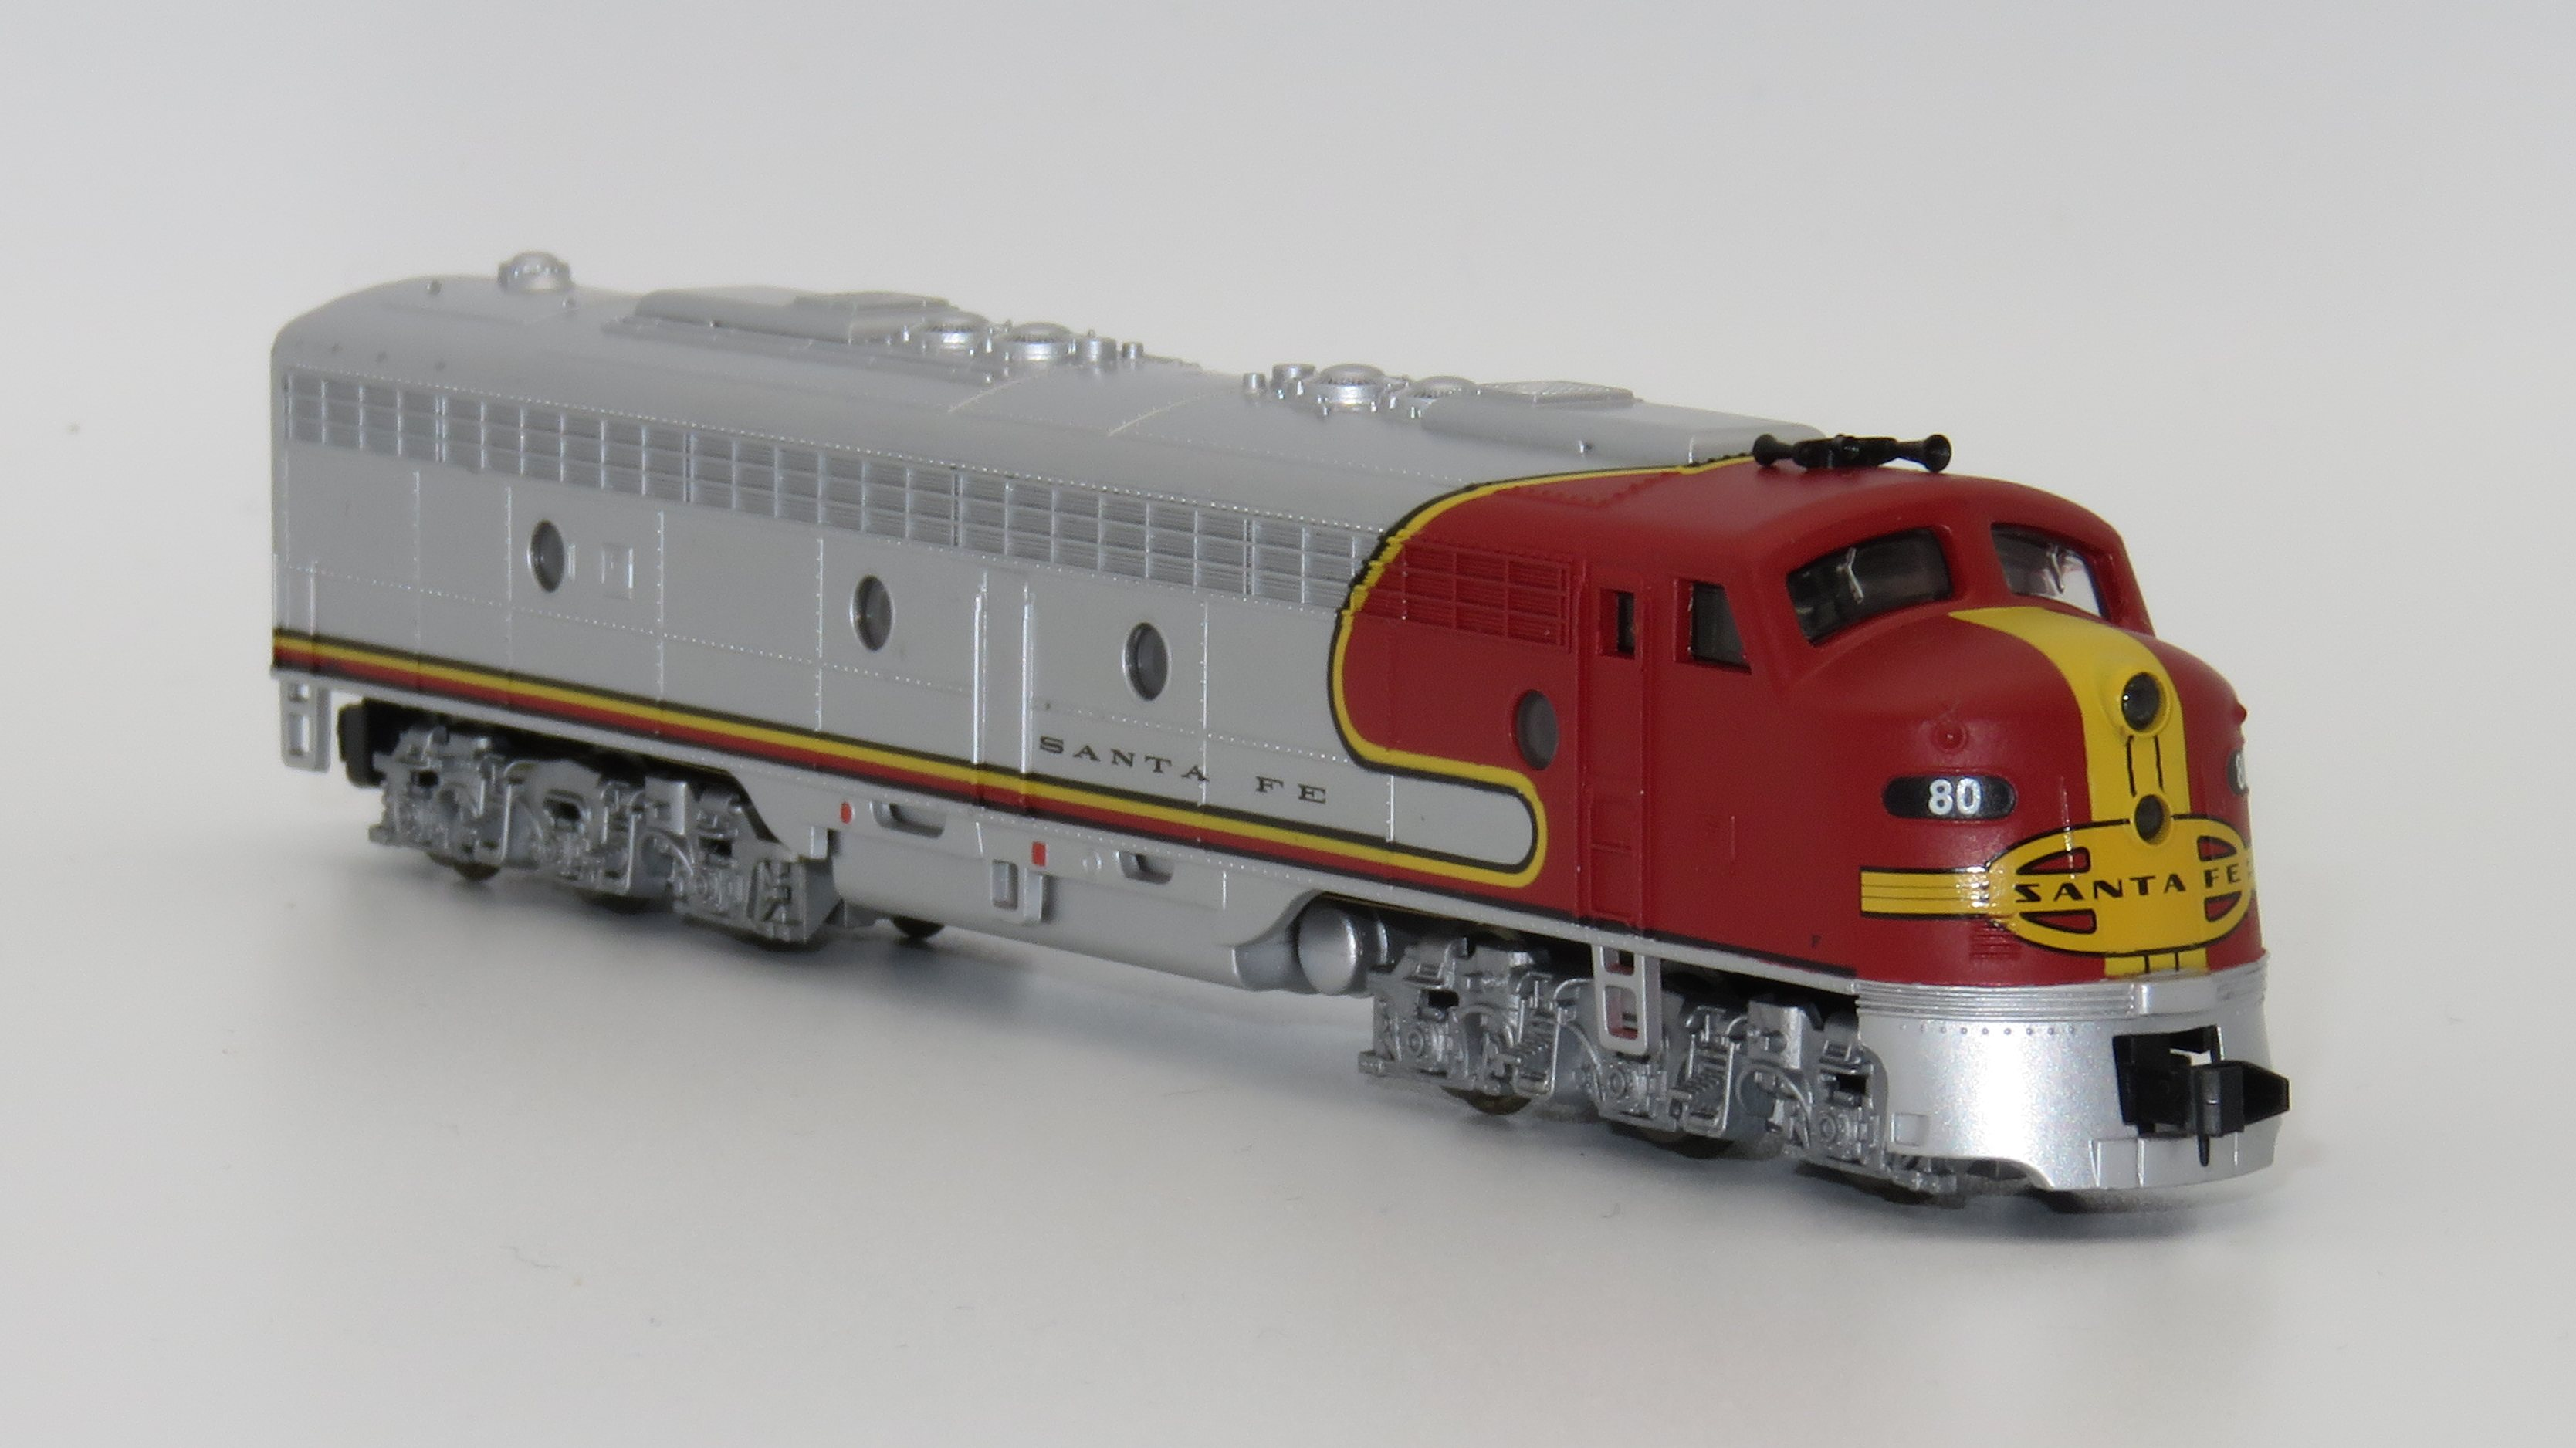 N Scale - Life-Like - 7827-A - Locomotive, Diesel, EMD E8 - Santa Fe - 80L